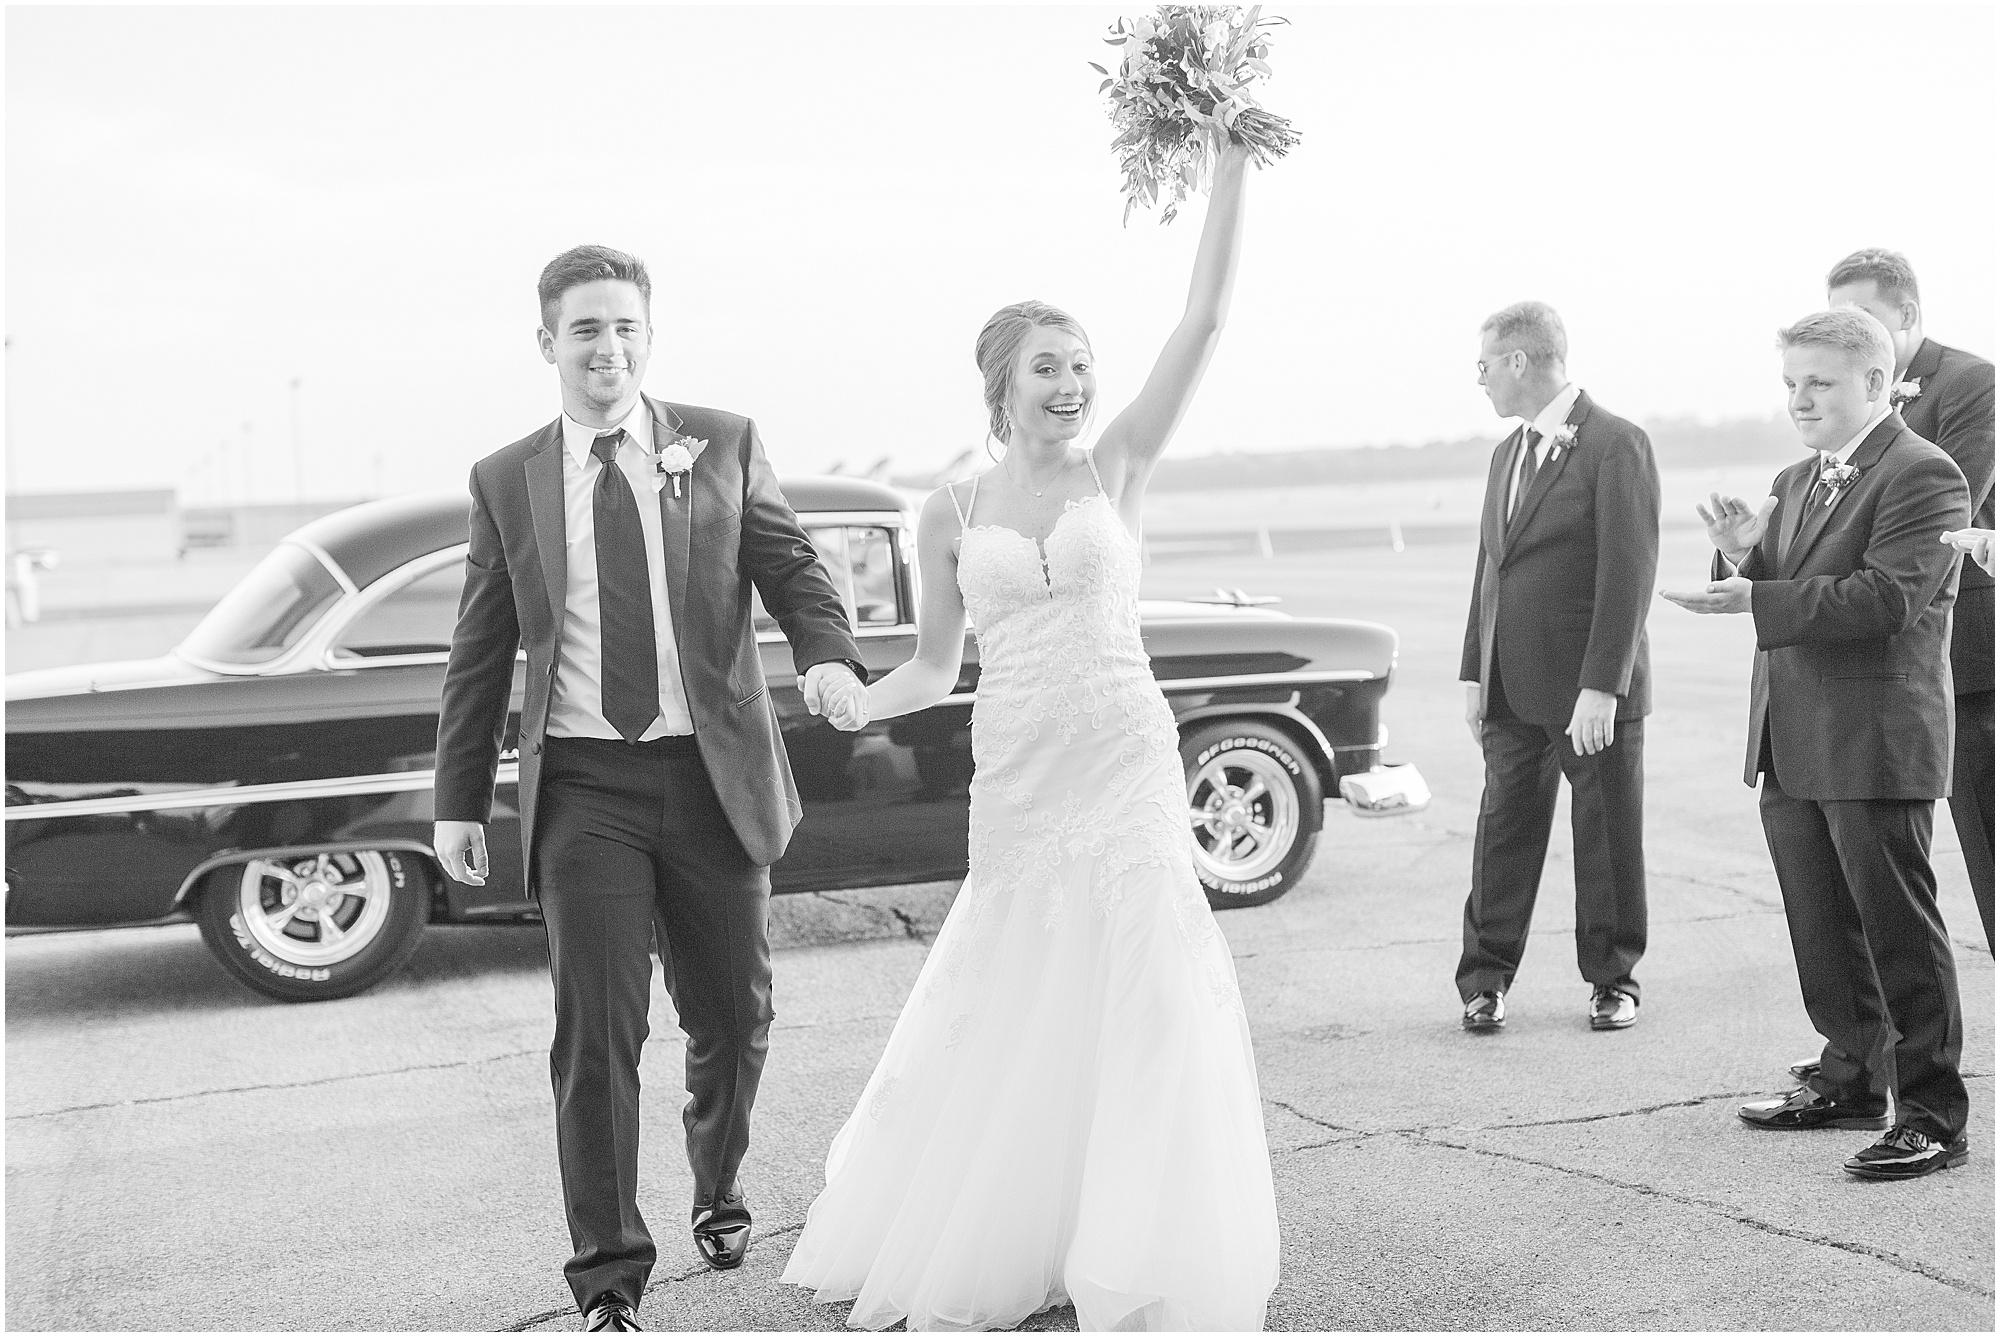 meridian-mississippi-wedding-meridian-aviation_0077.jpg